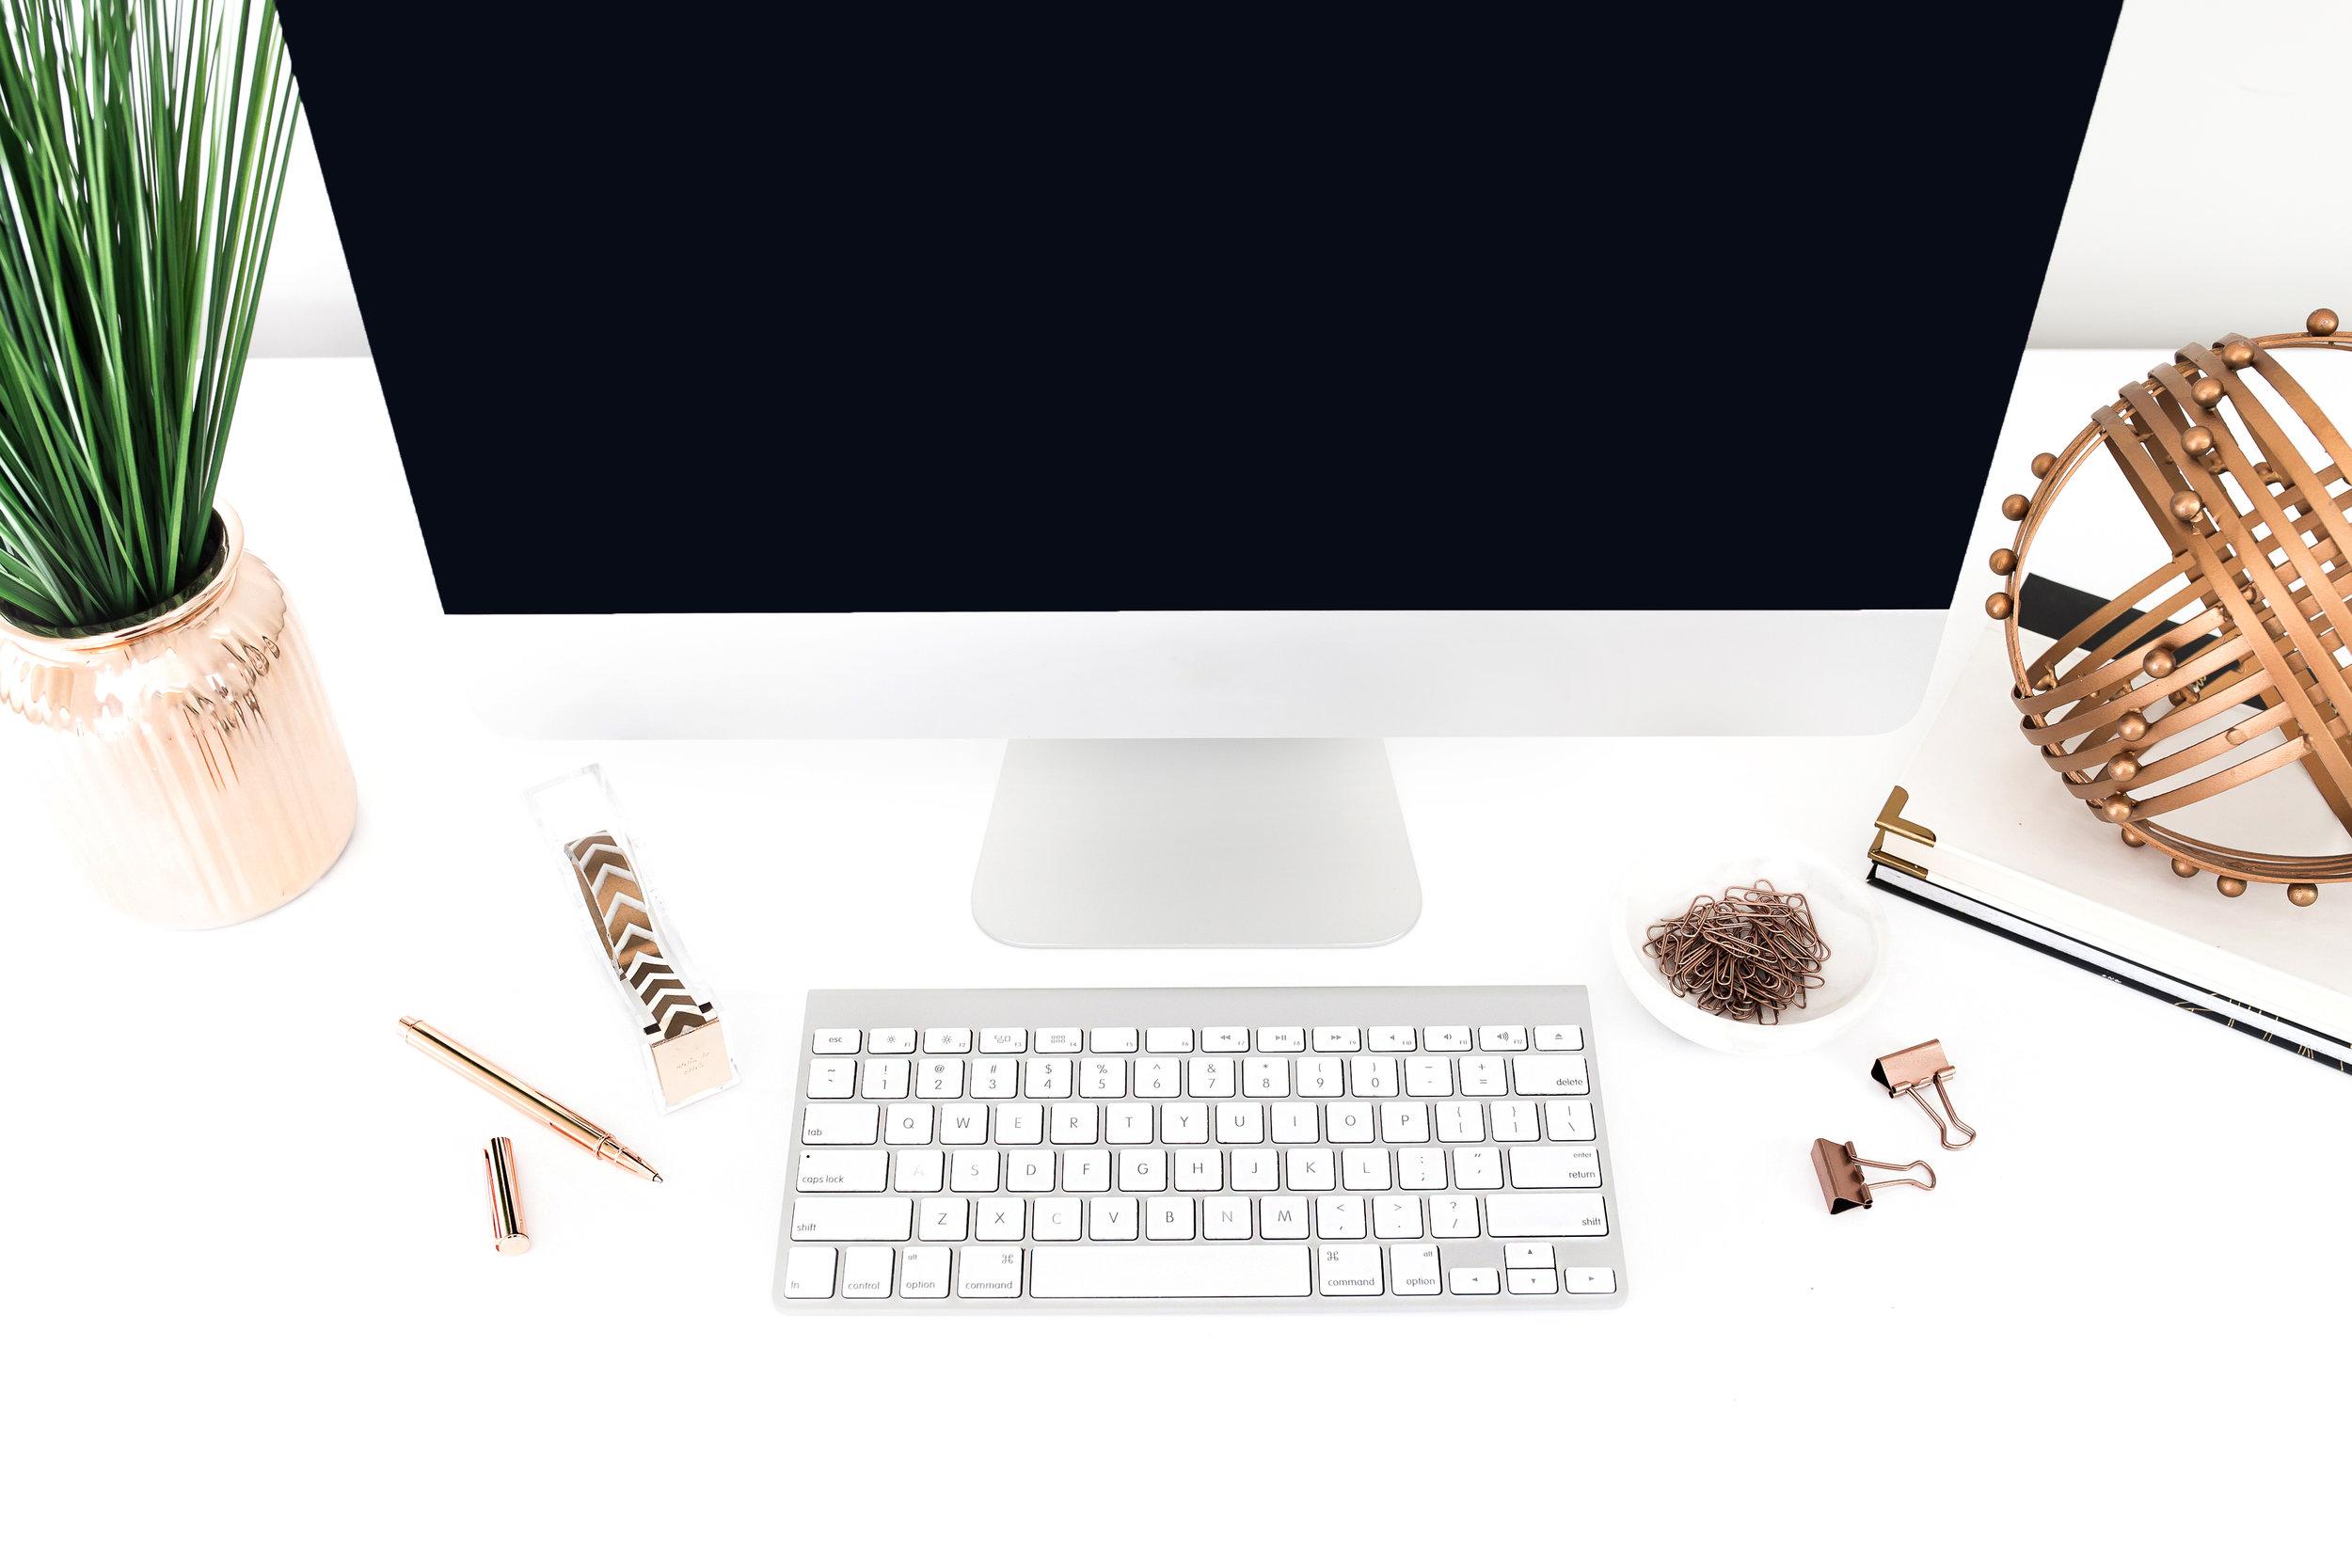 haute-stock-photography-copper-green-styled-desktop-final-10.jpg